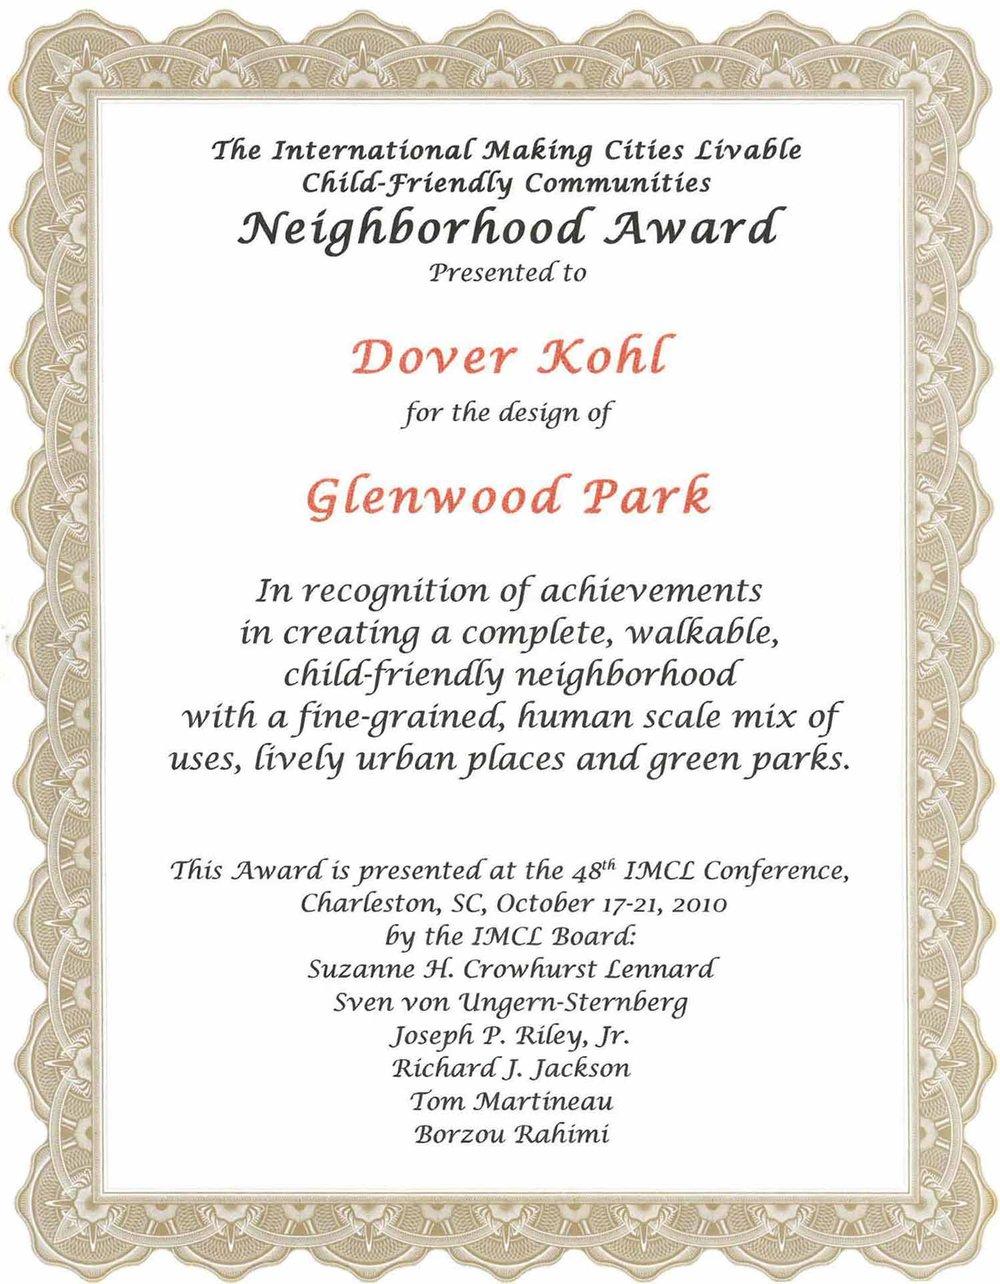 2010- neighborhood award-glenwood park.jpg